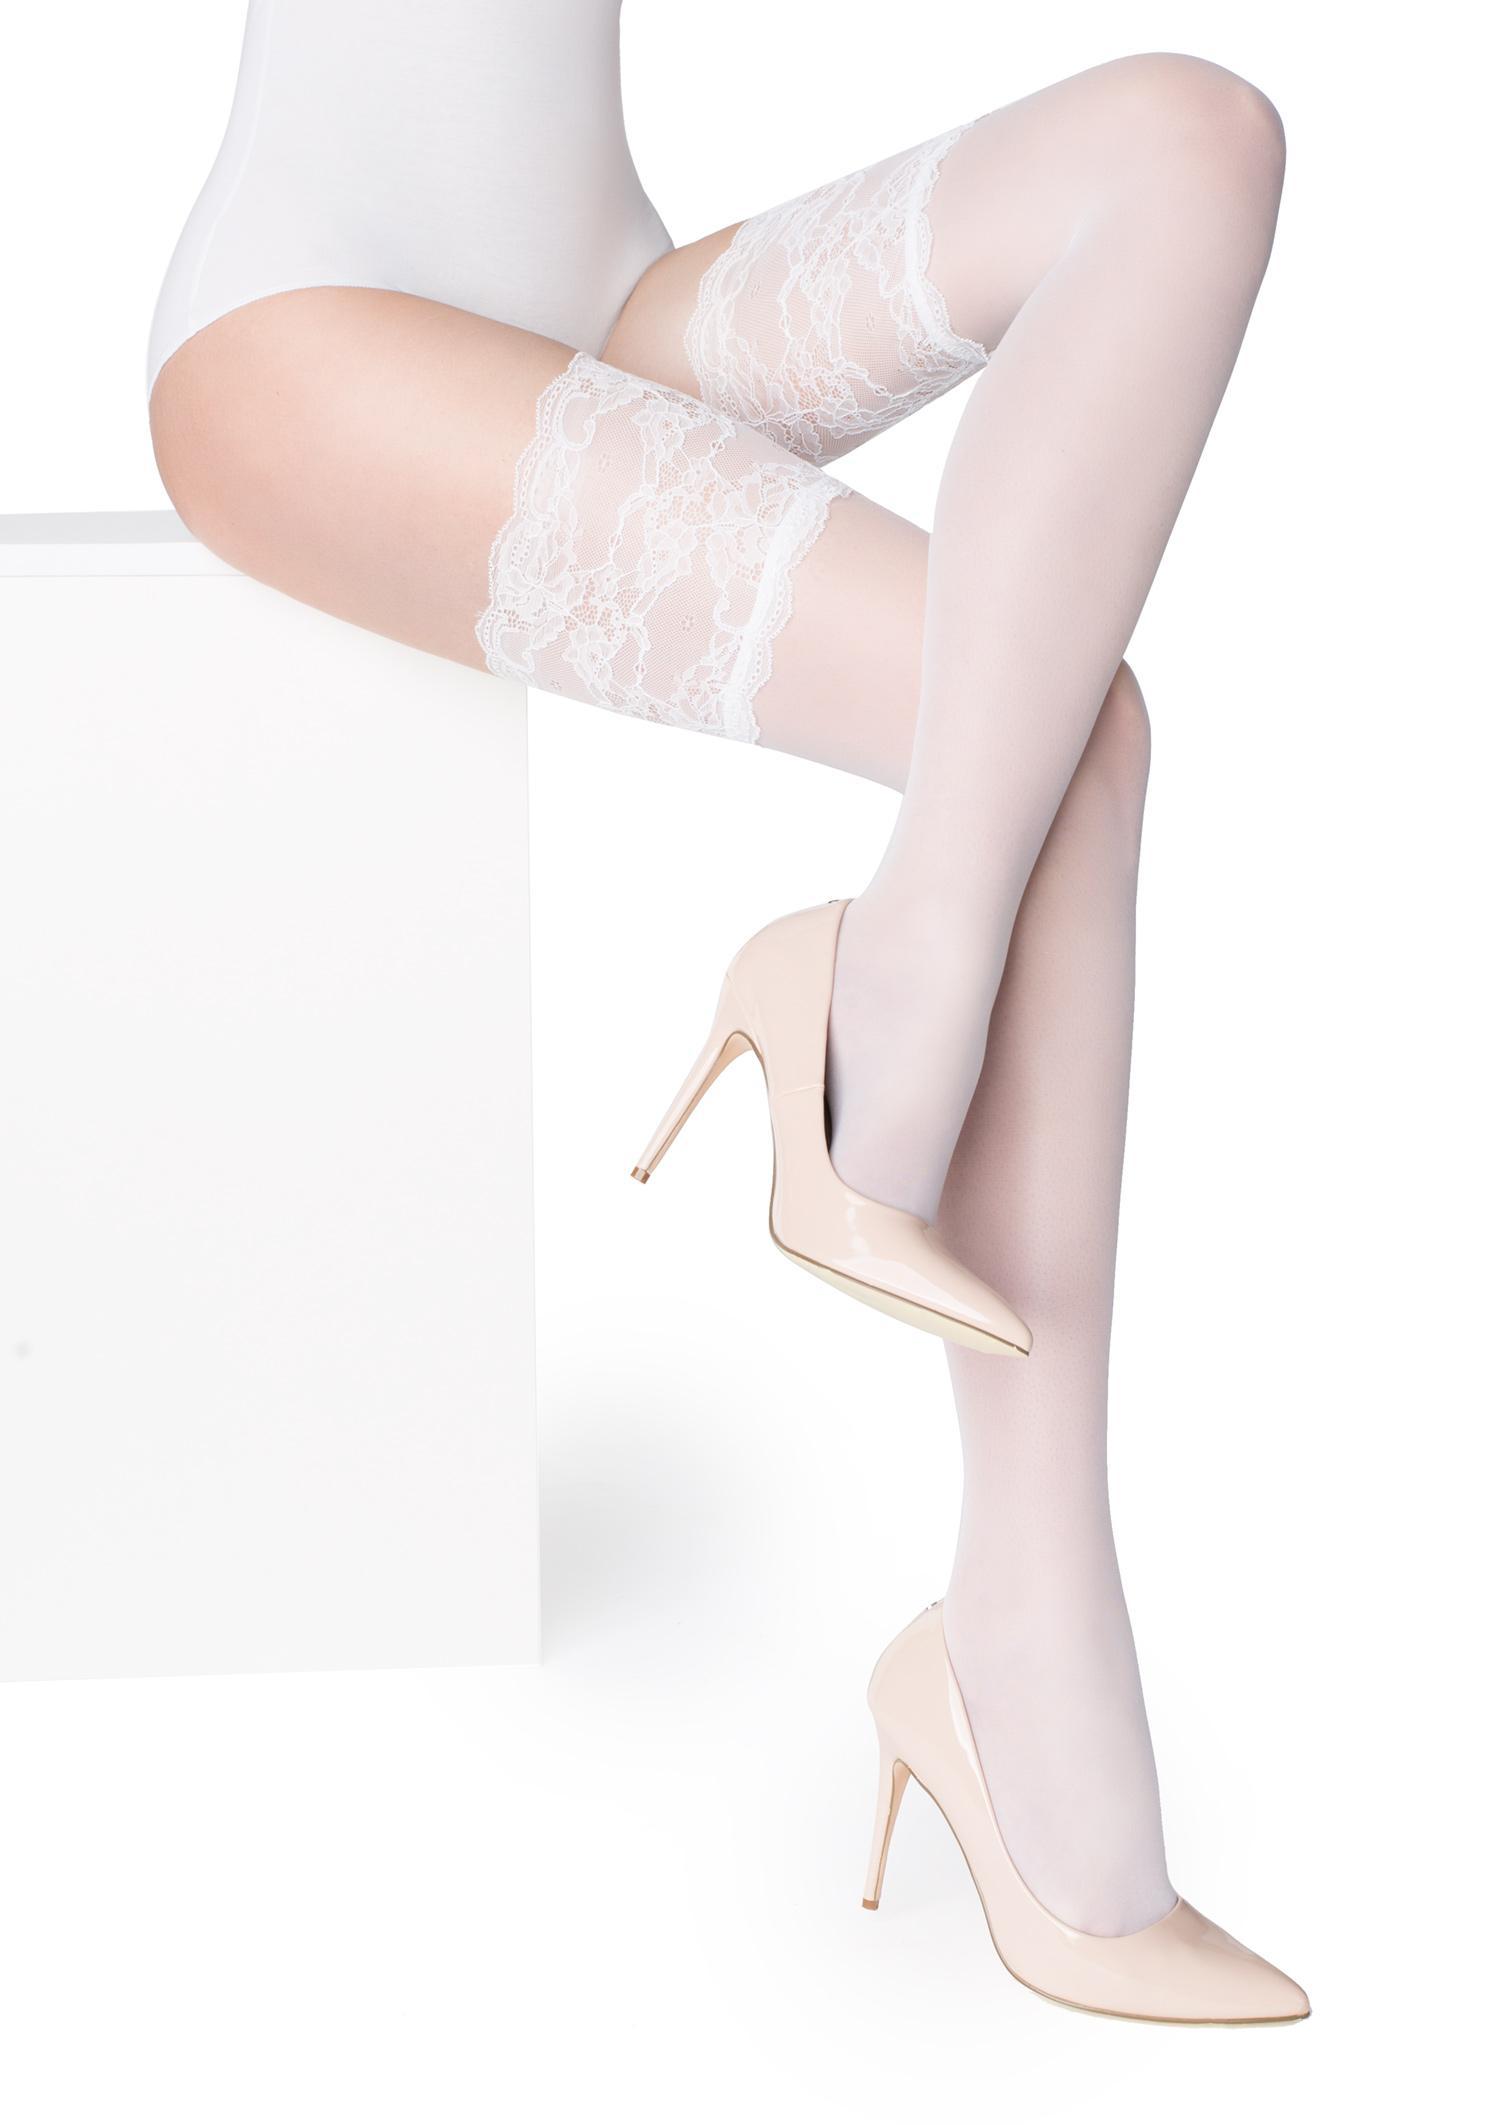 https://golden-legs.com.ua/images/stories/virtuemart/product/Pari_s.jpg